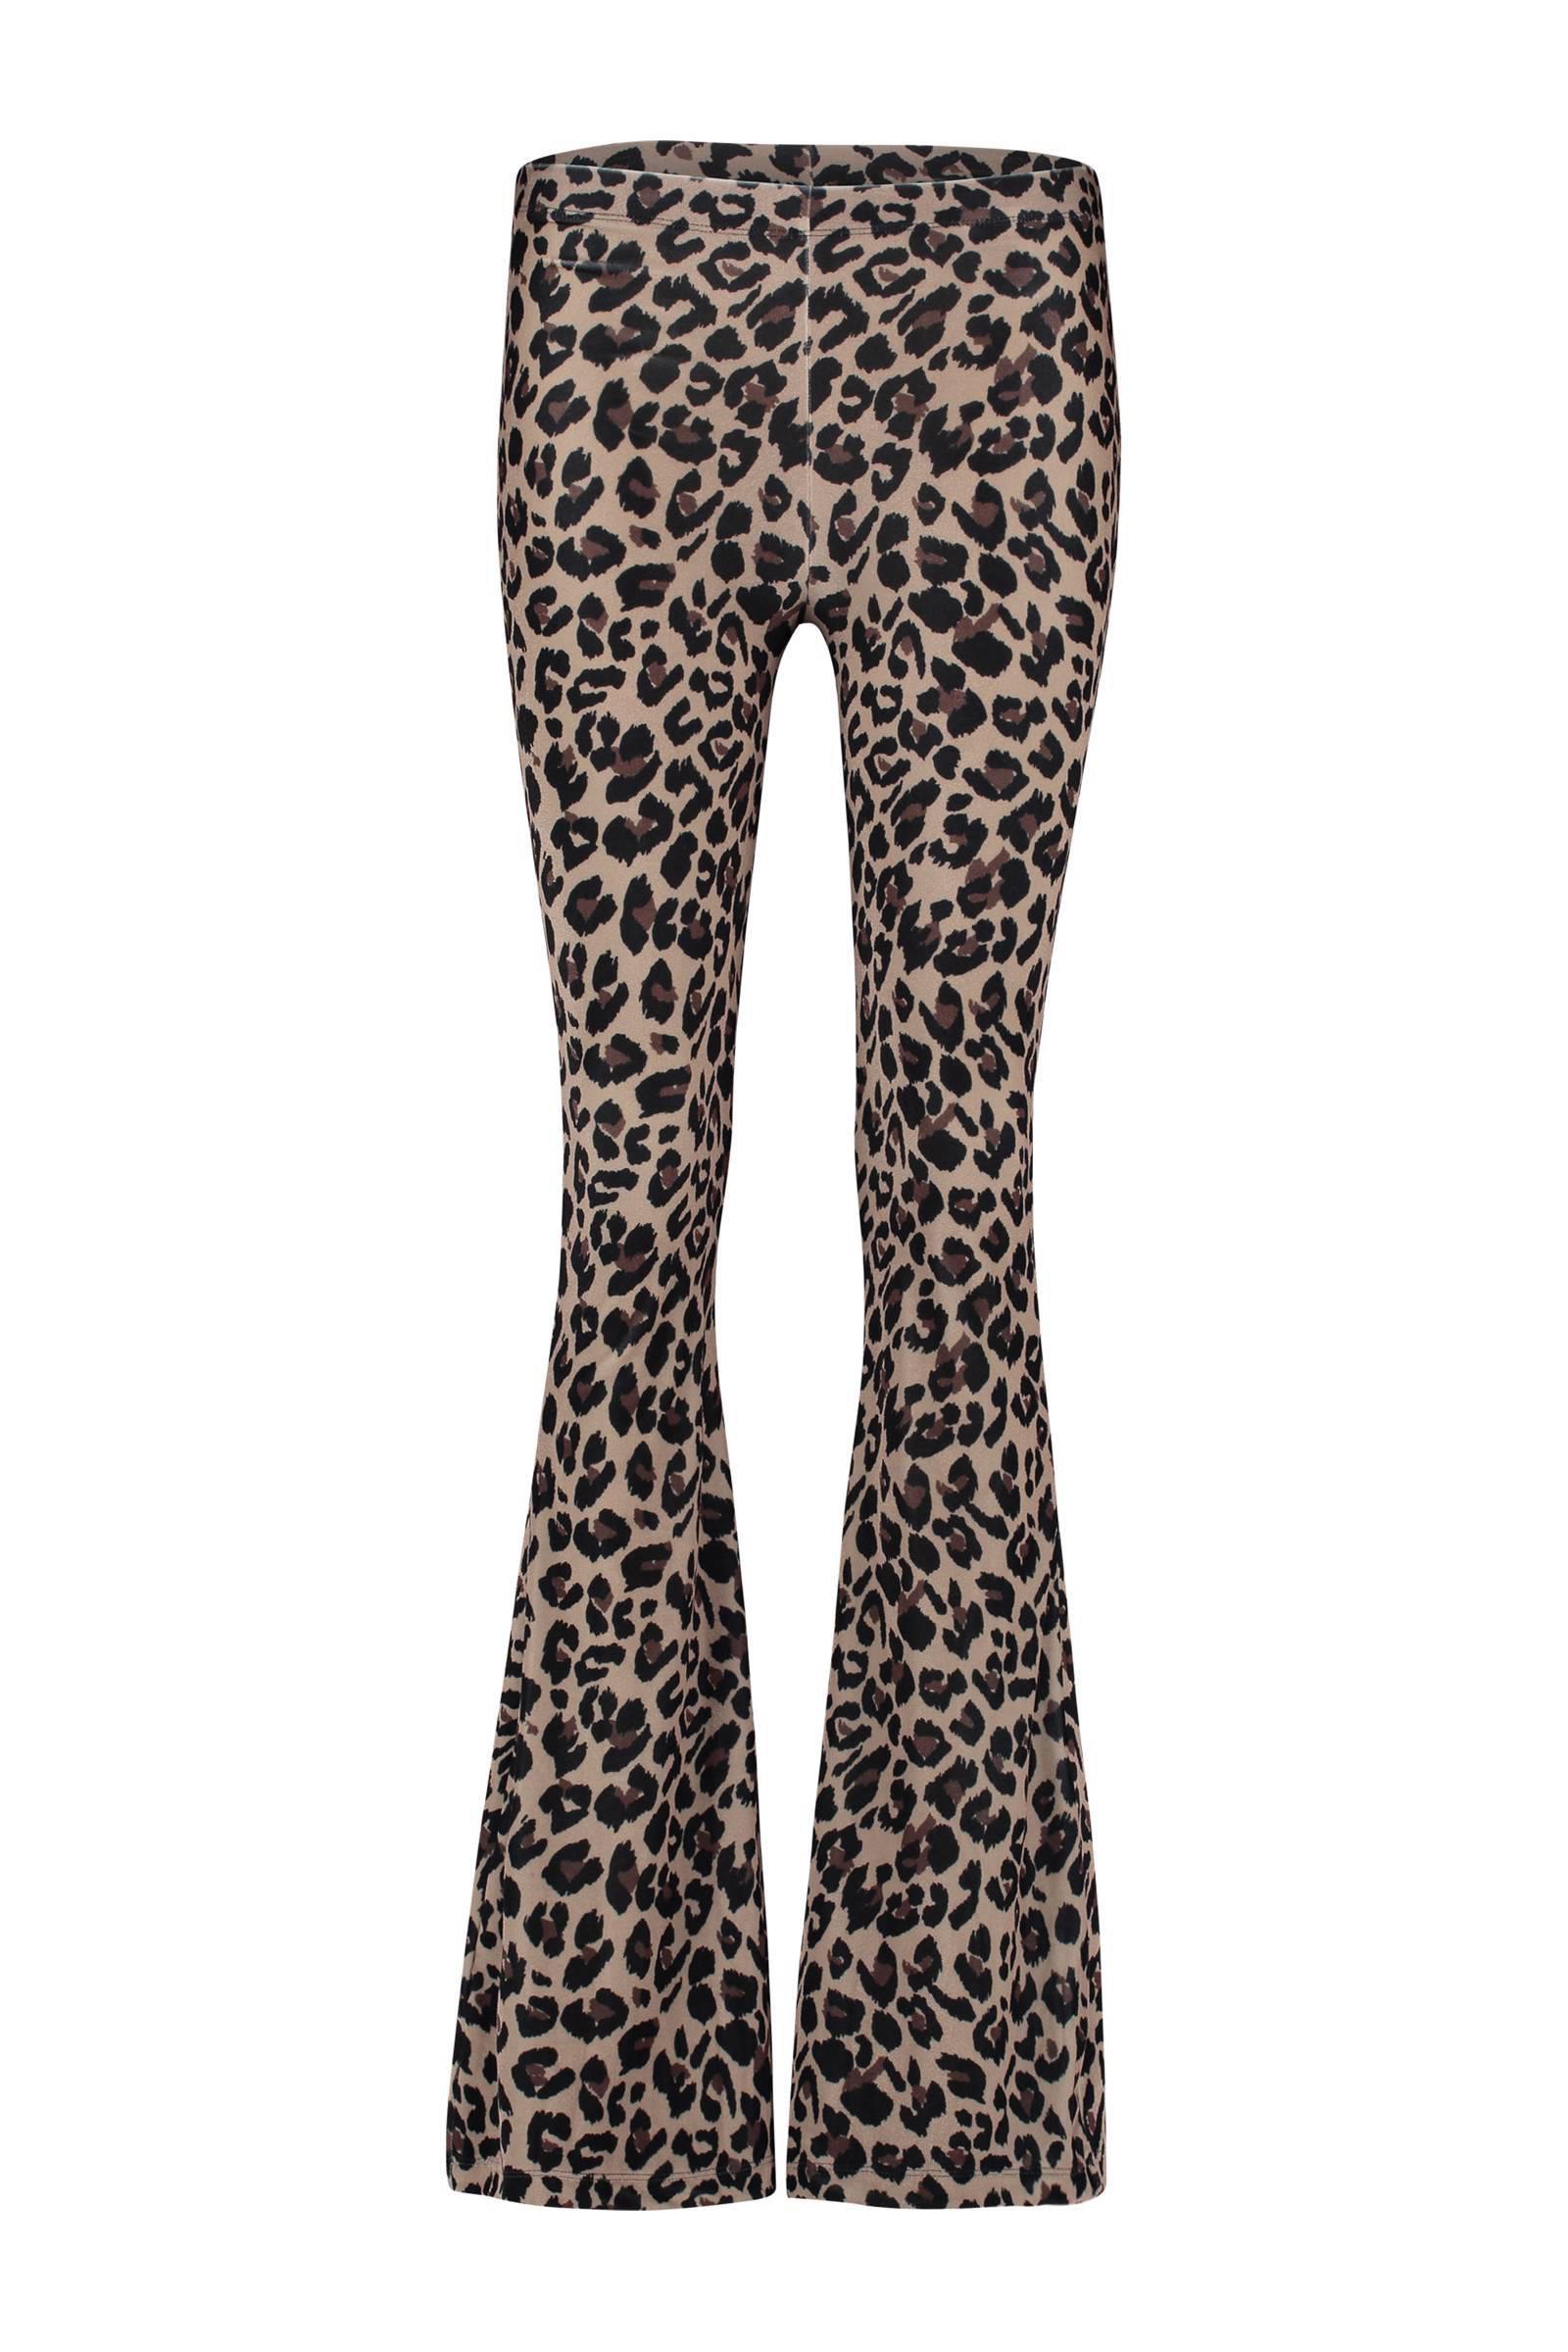 Verrassend Catwalk Junkie Woodstock fluwelen flared broek met panterprint LX-58